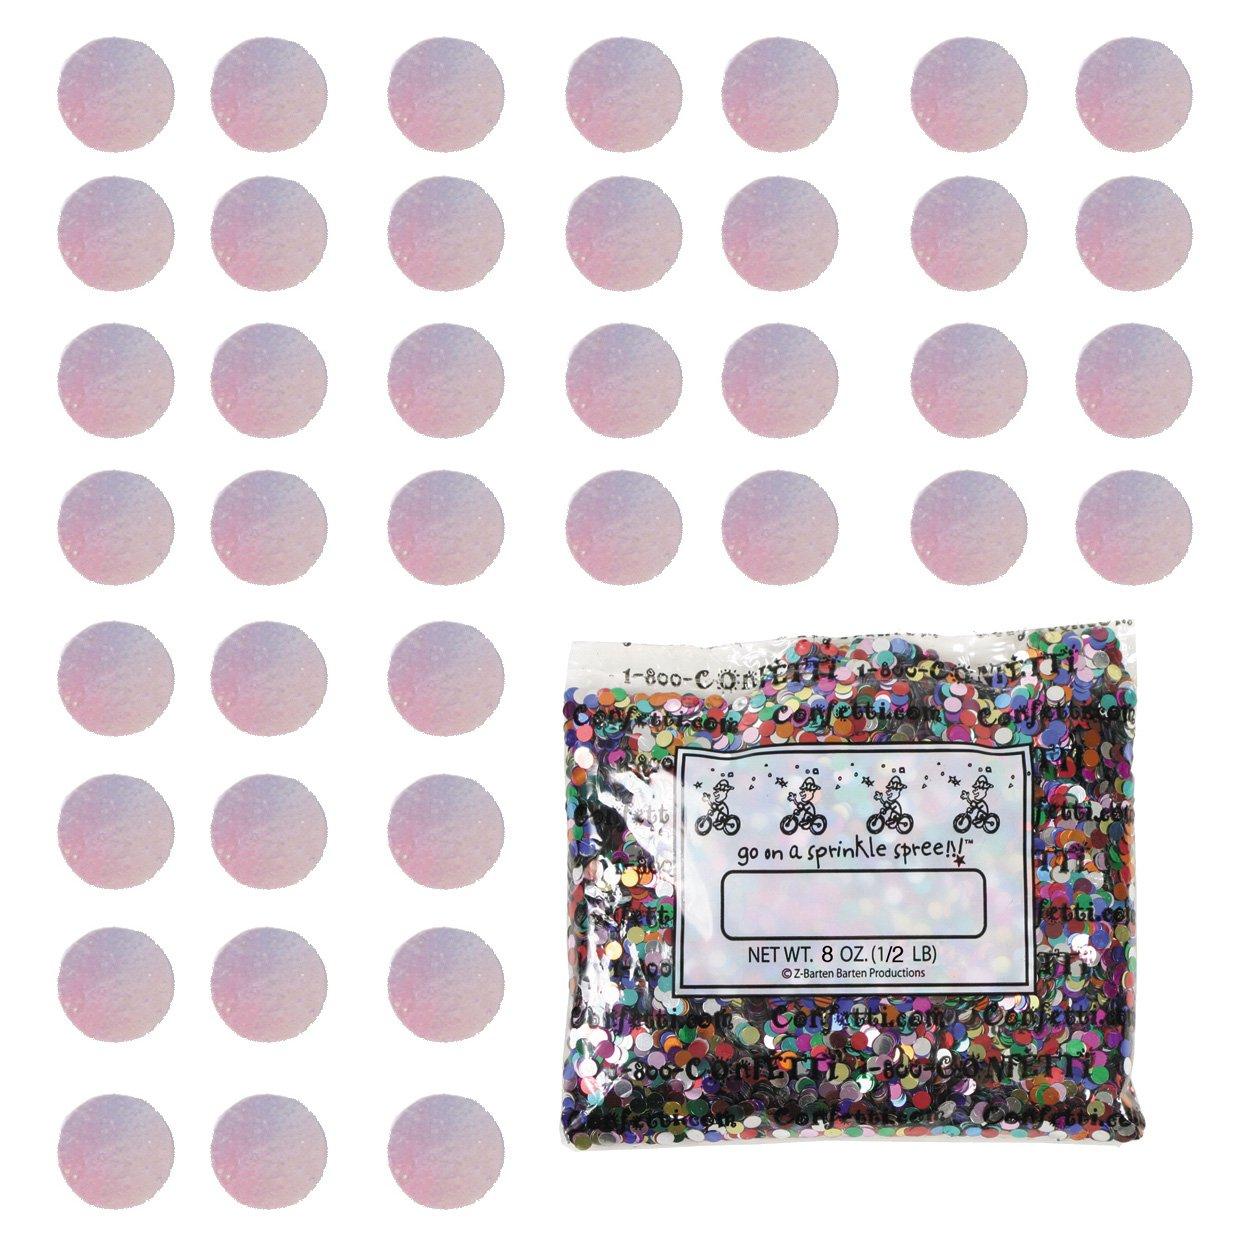 Confetti Circle 1/4'' Iridescent - Half Pound (8 oz) Free Ship (8681)